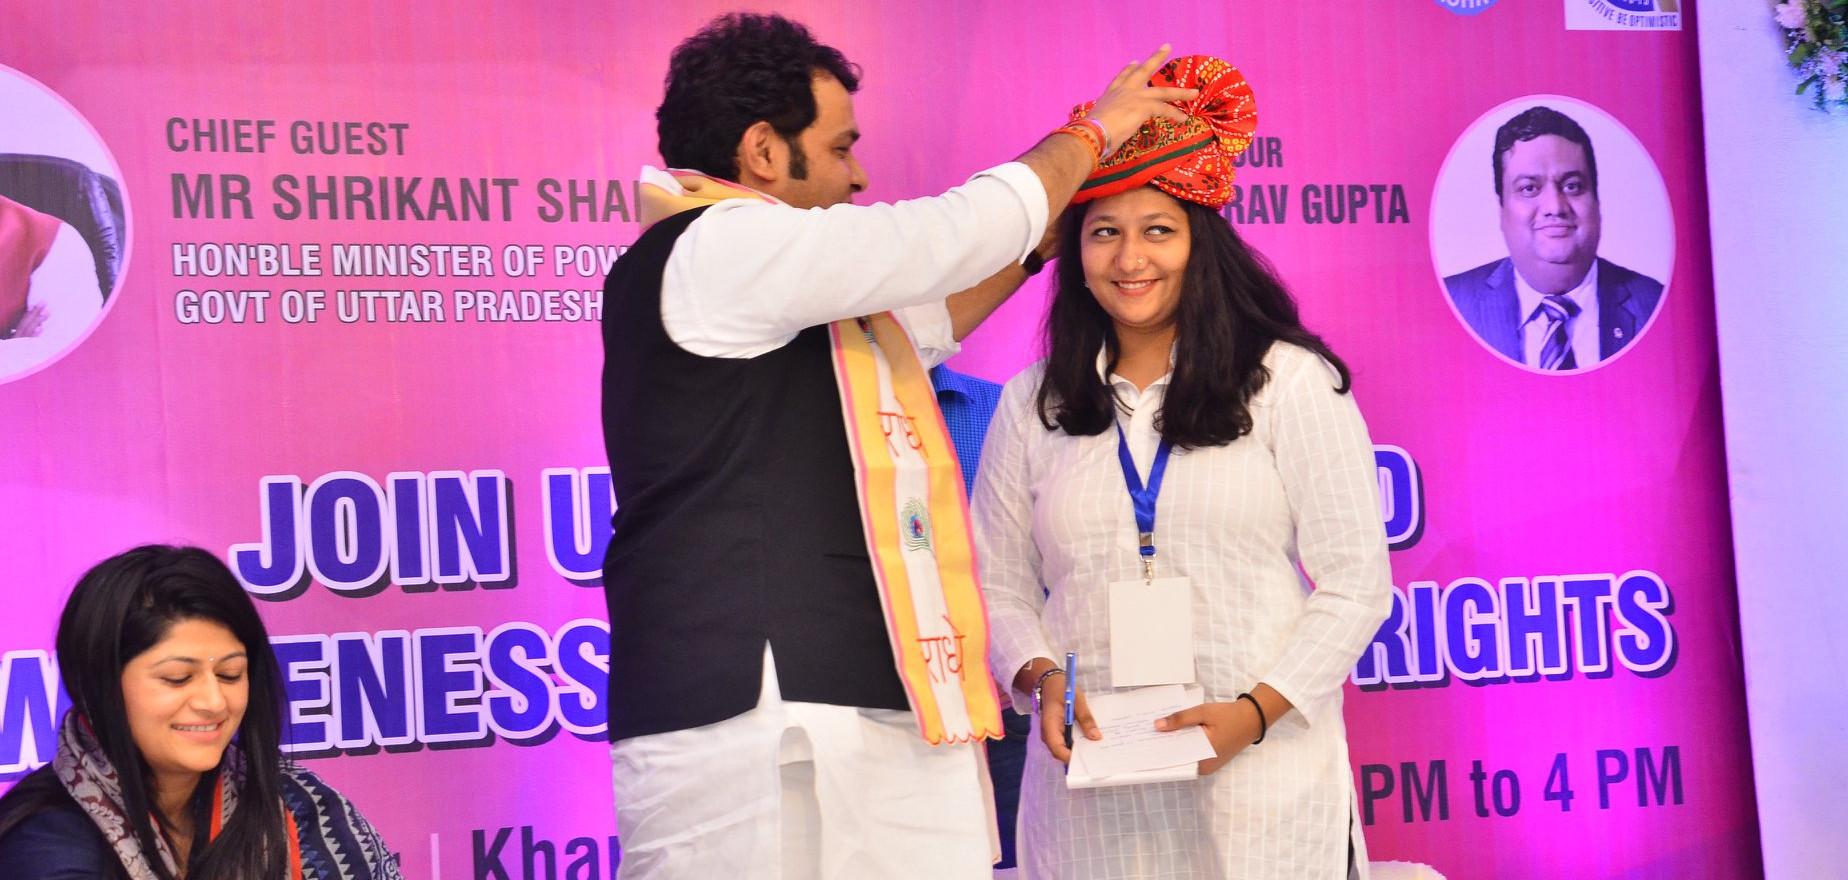 Felicitated by cabinet minsiter Shrikant Sharma Ji